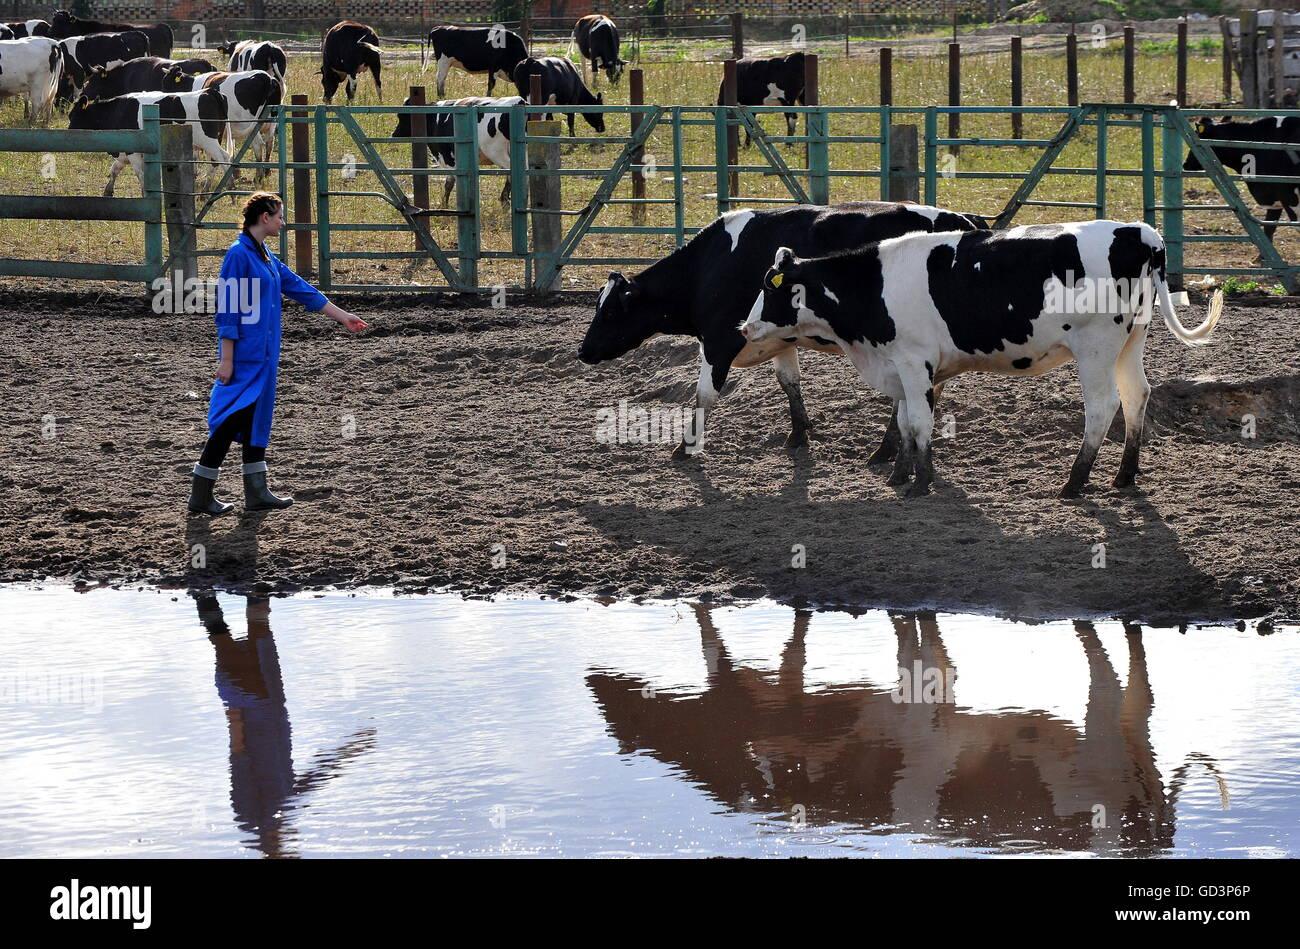 Belarus, Brest Region. 11th July, 2016. Tatiana Budnik, a student of Vitebsk State Academy of Veterinary Medicine, - Stock Image